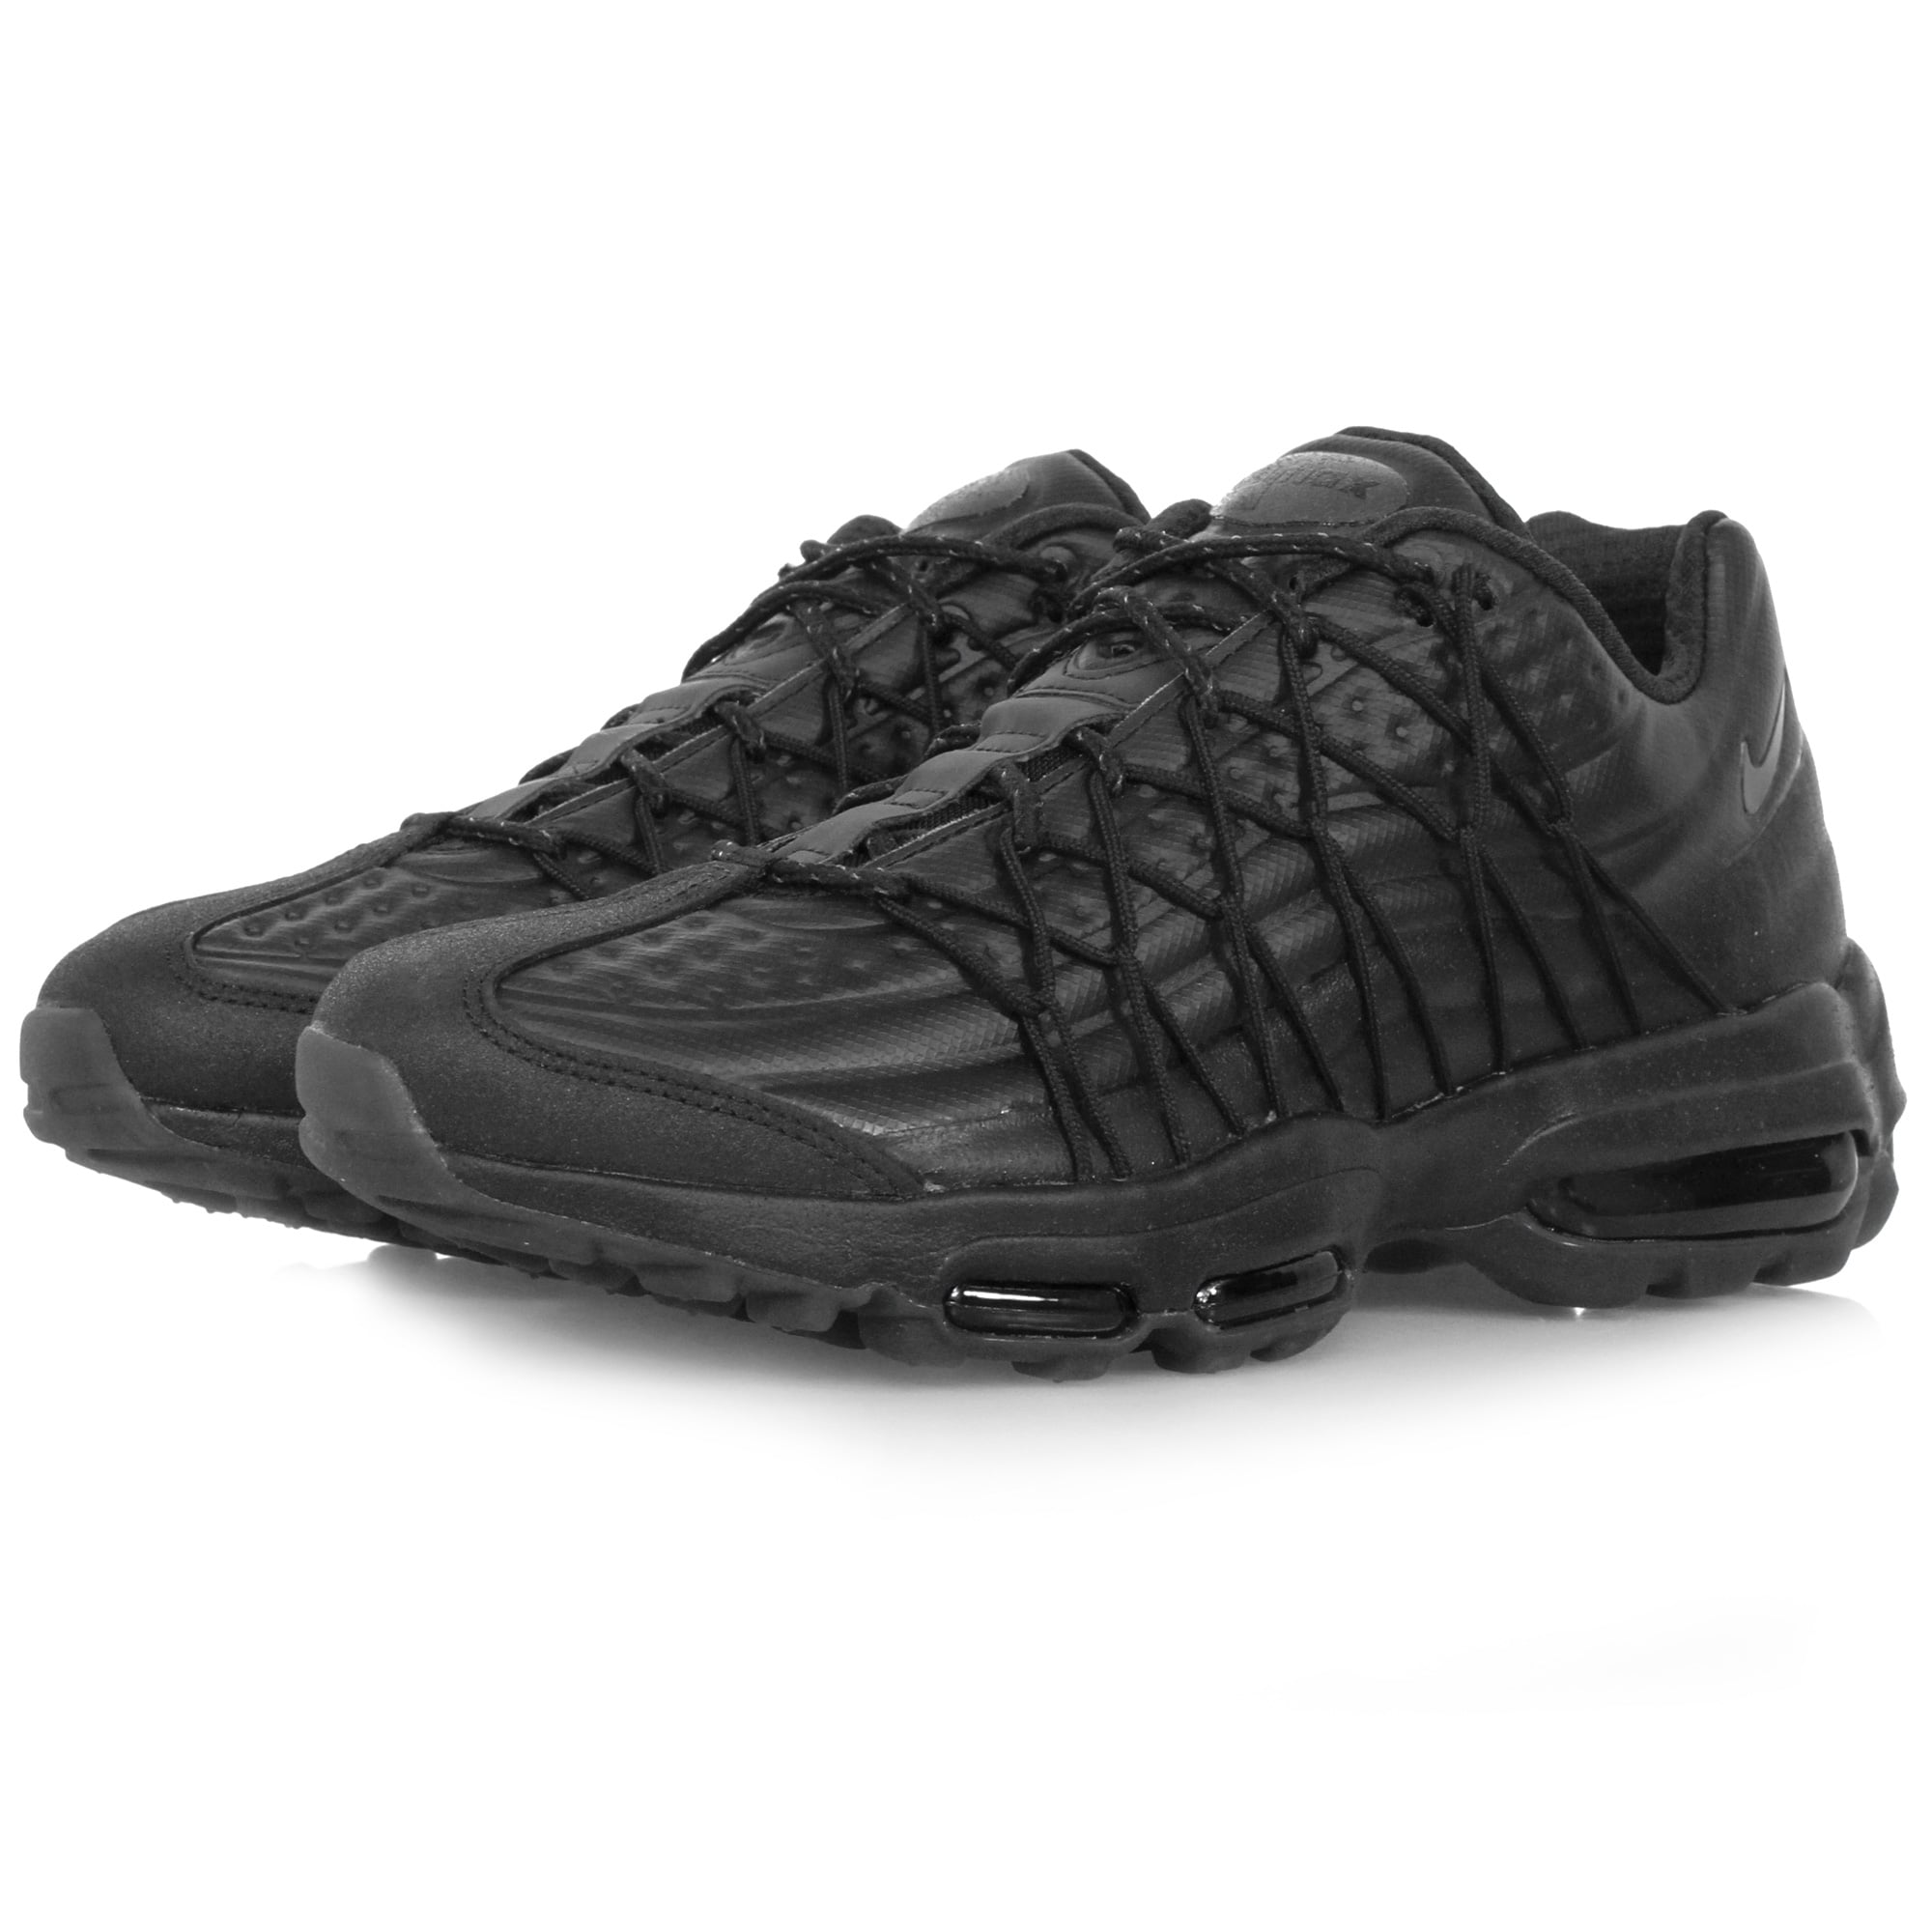 nike footwear nike air max 95 ultra se premium black shoe. Black Bedroom Furniture Sets. Home Design Ideas